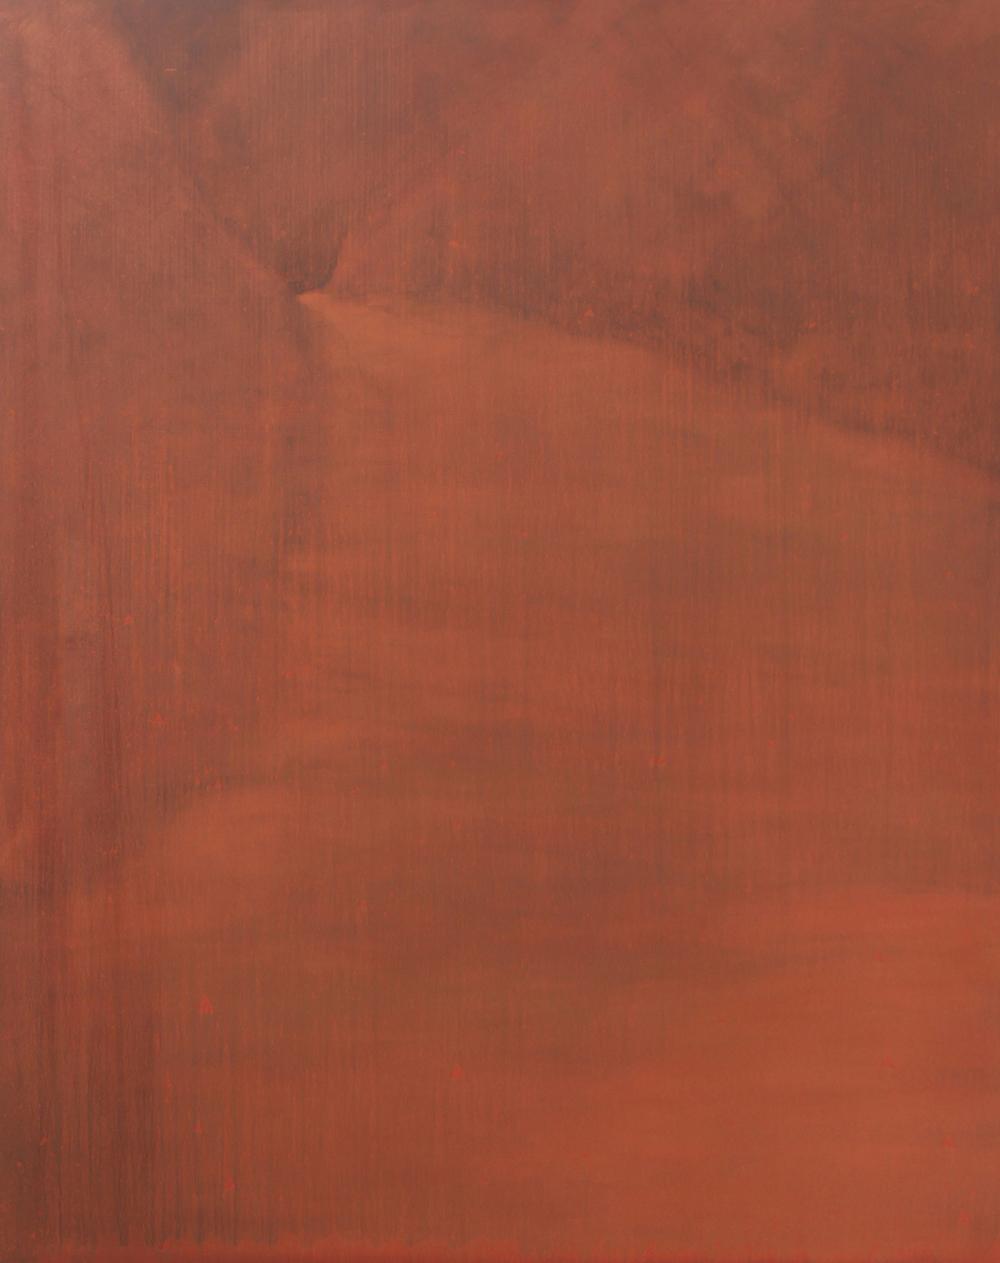 Kiss And Run, 2015, oil on canvas, 150 x 120cm